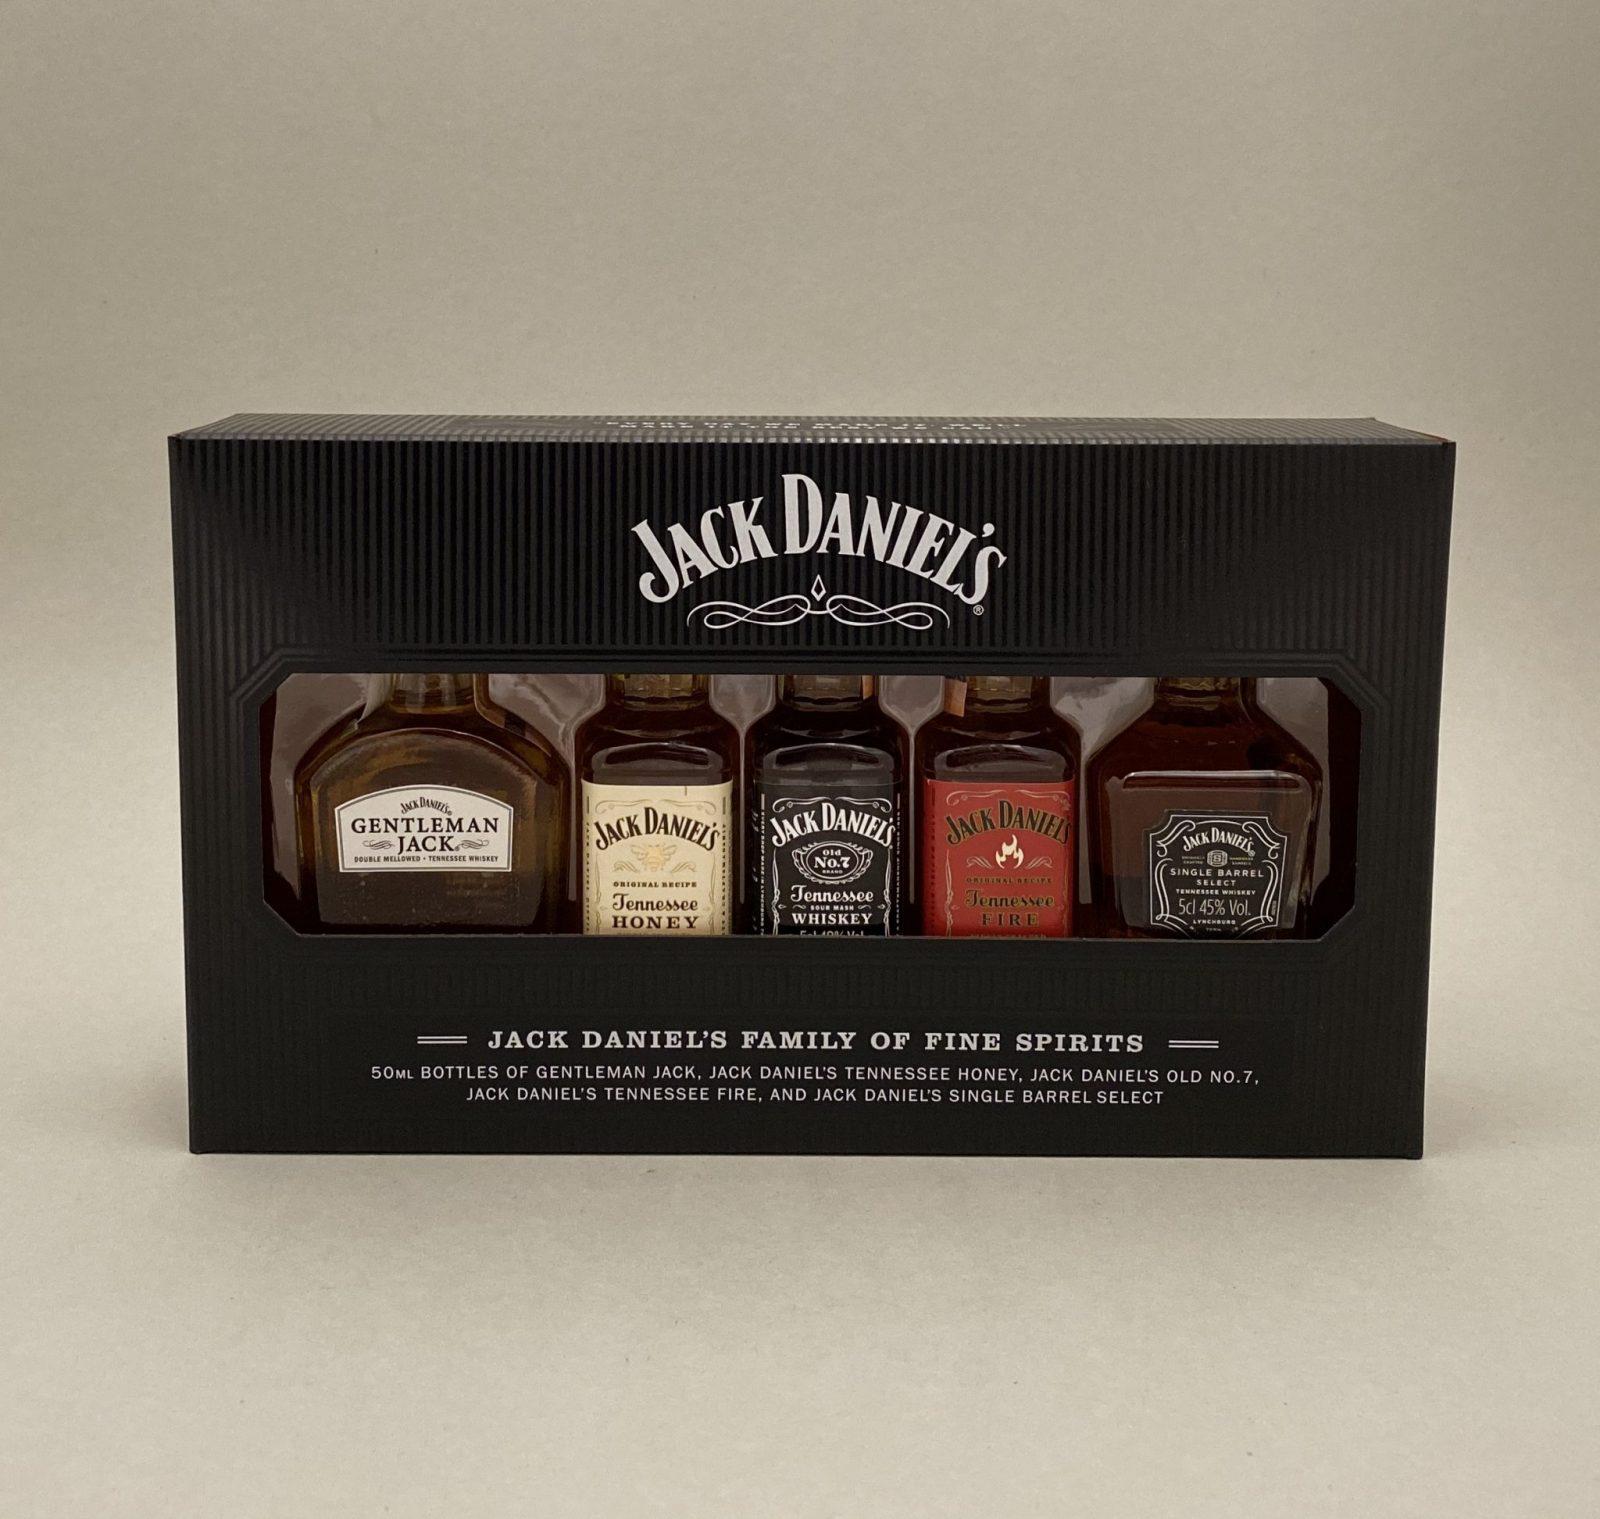 Jack Daniel's Family Mini Set 39%, Bottleshop Sunny wines slnecnice mesto, petrzalka, Škótska Whisky, rozvoz alkoholu, eshop